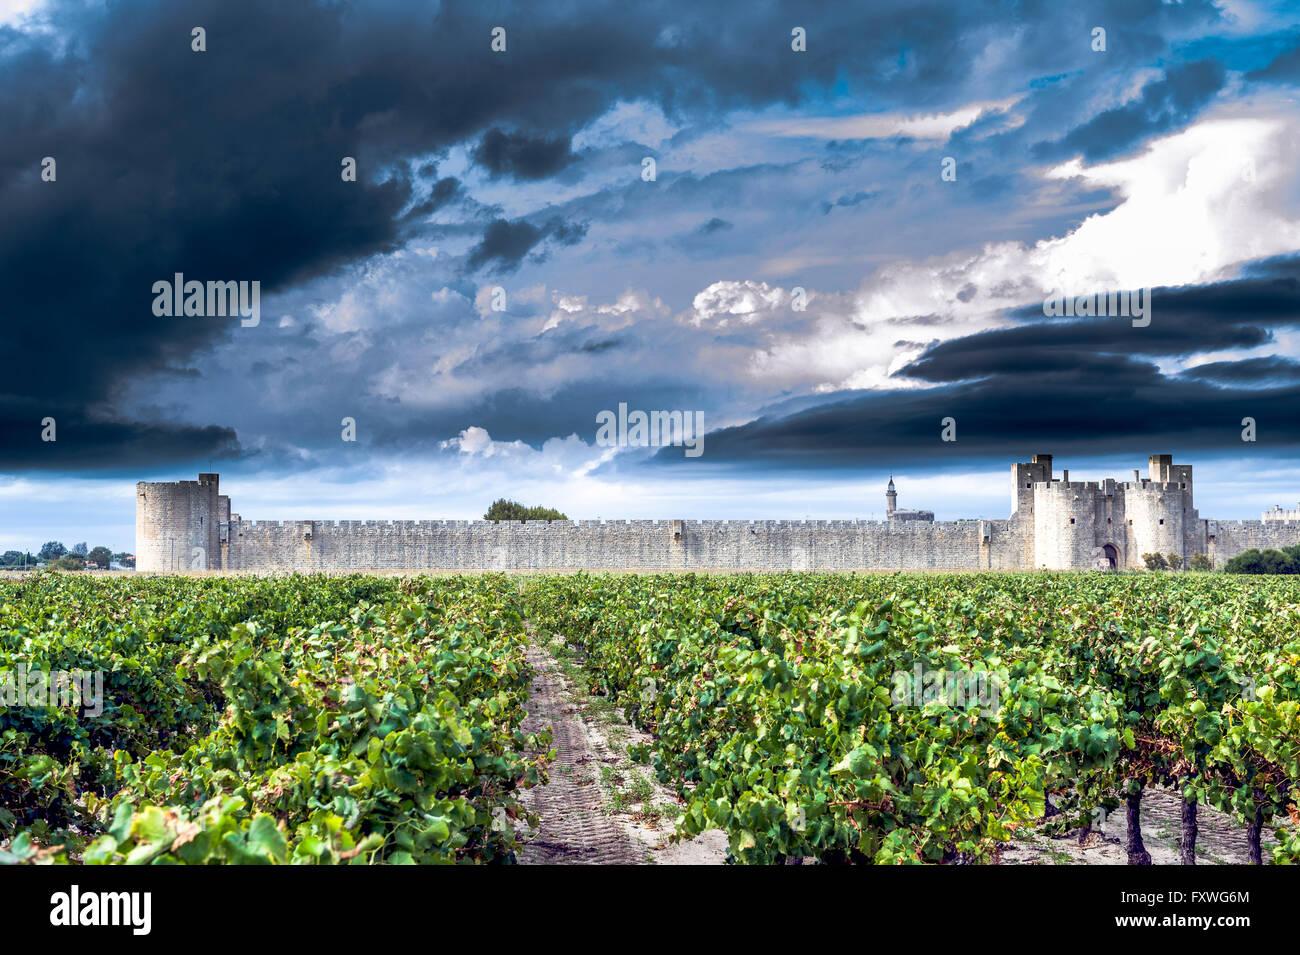 Europe, France, Gard. Aigues-Mortes. City wall of Aigues-Mortes. - Stock Image